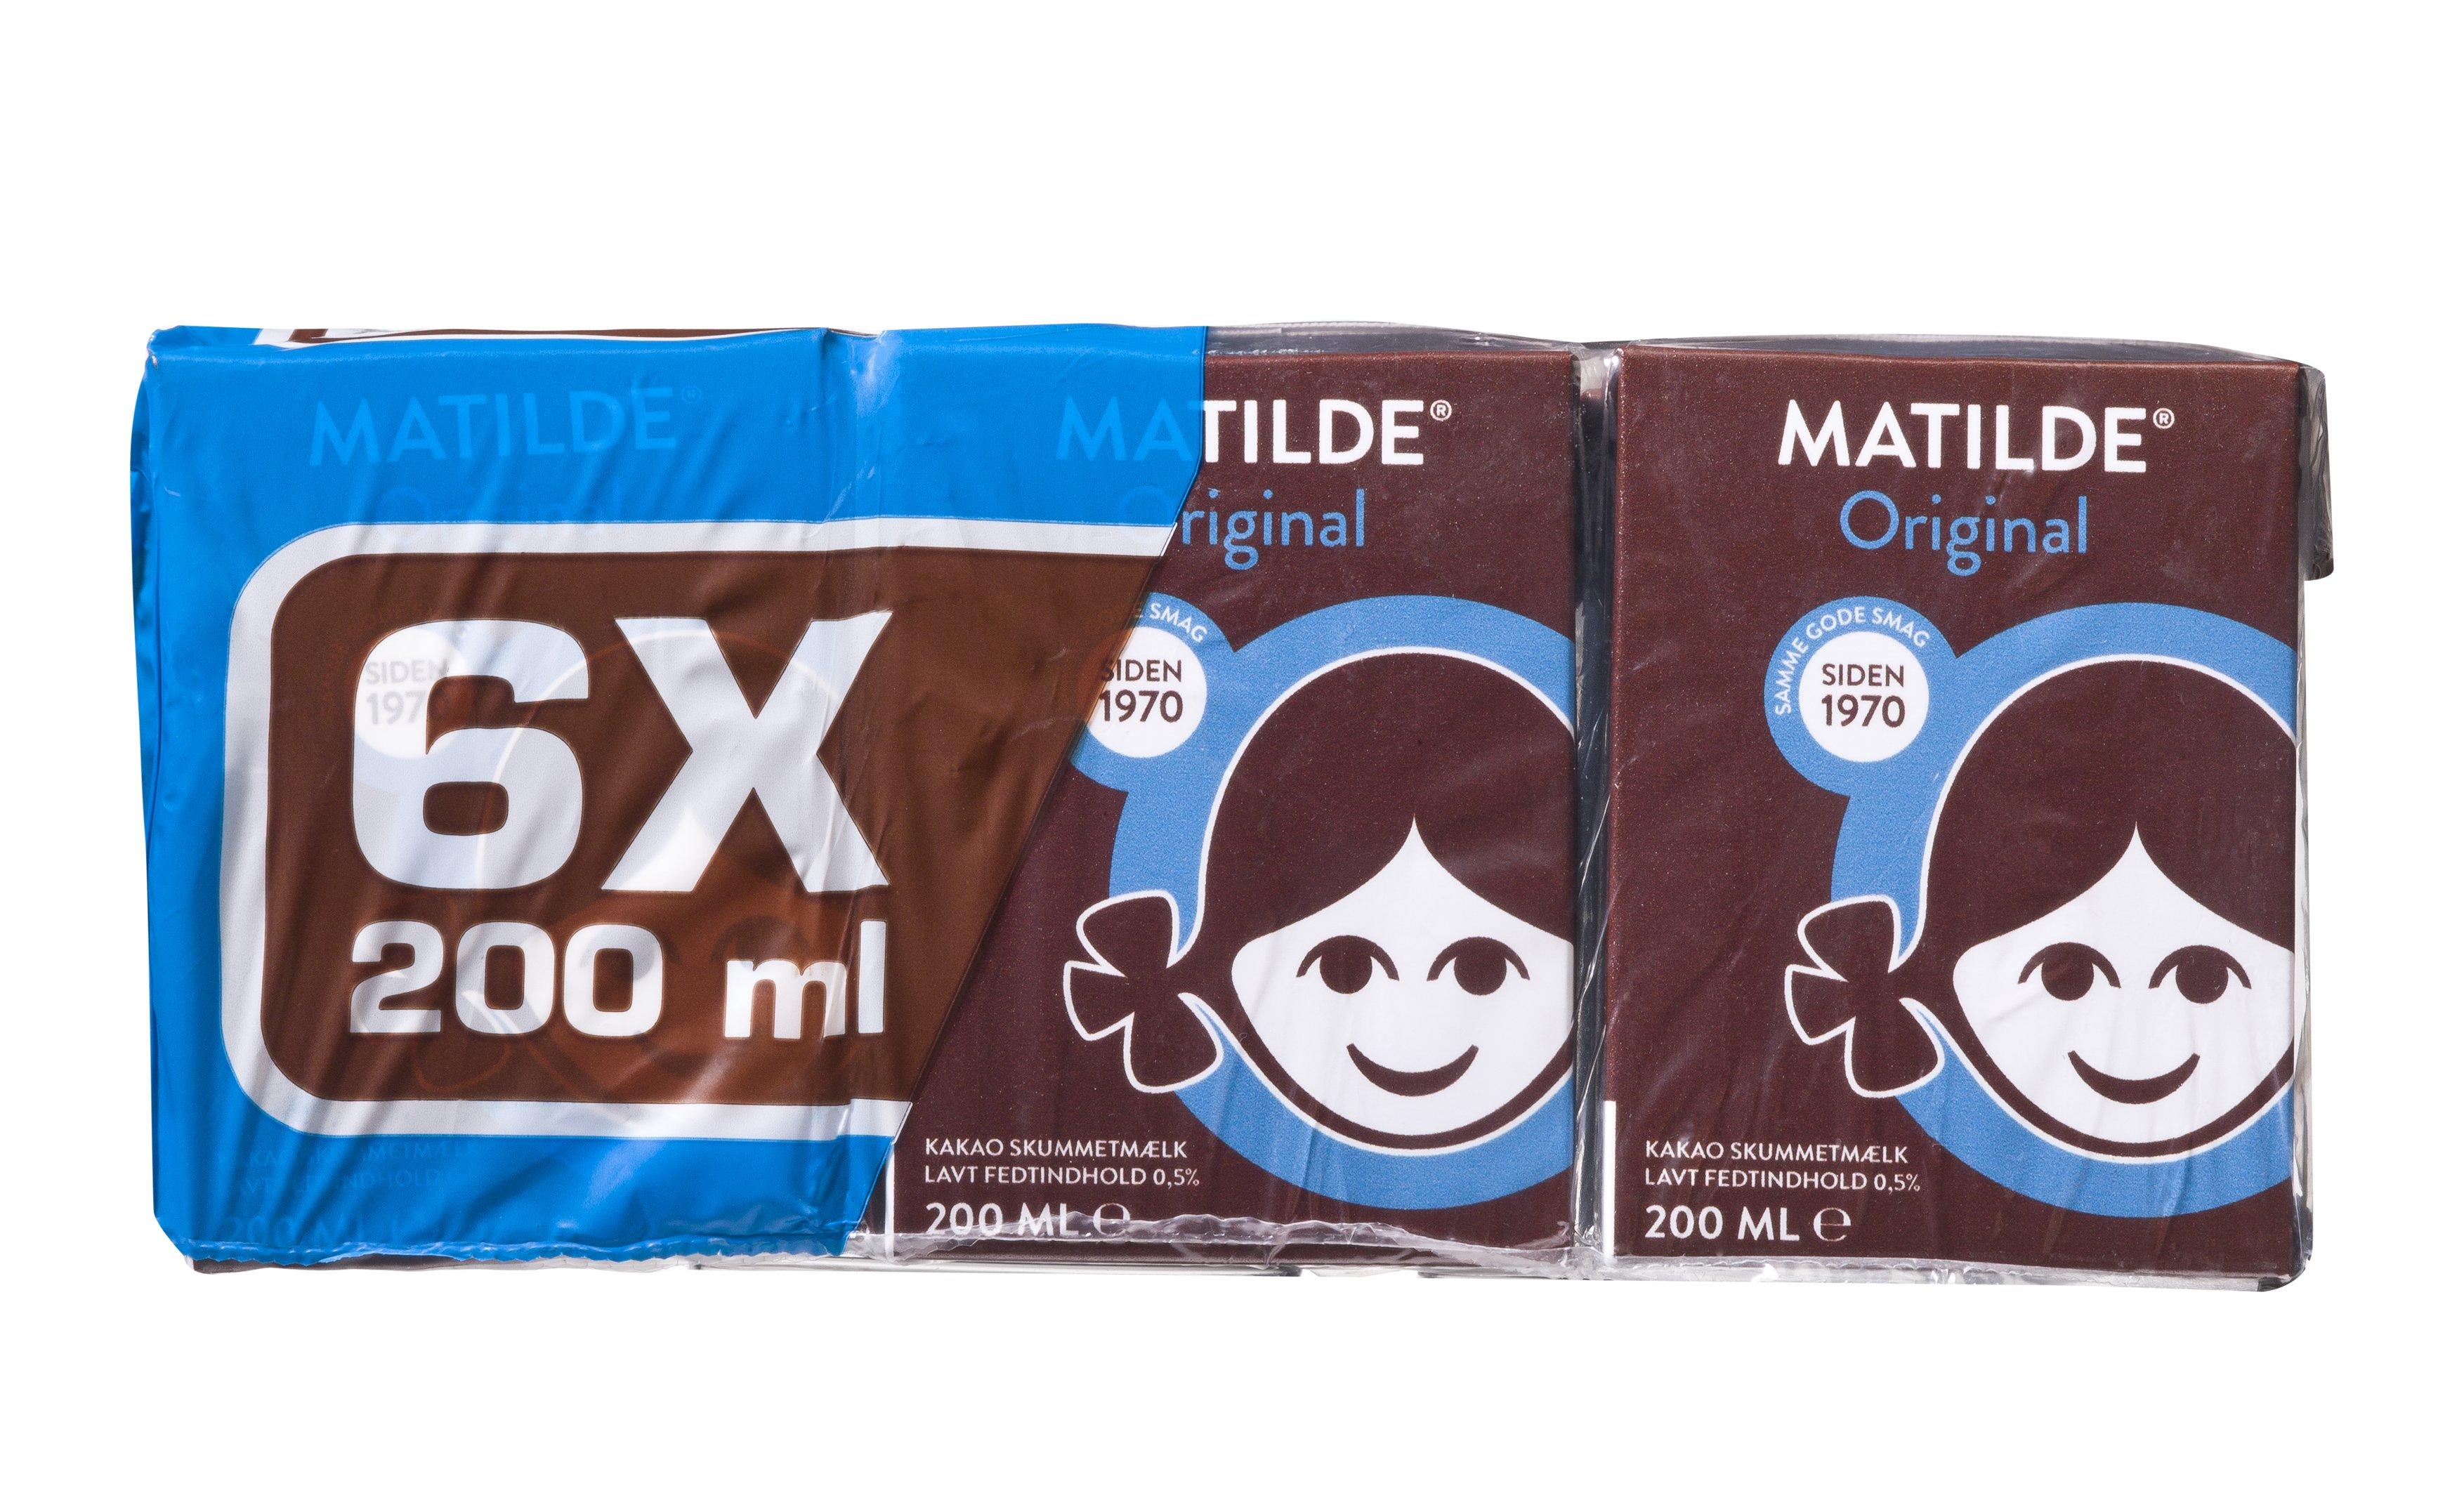 Original kakaomælk 0,5%